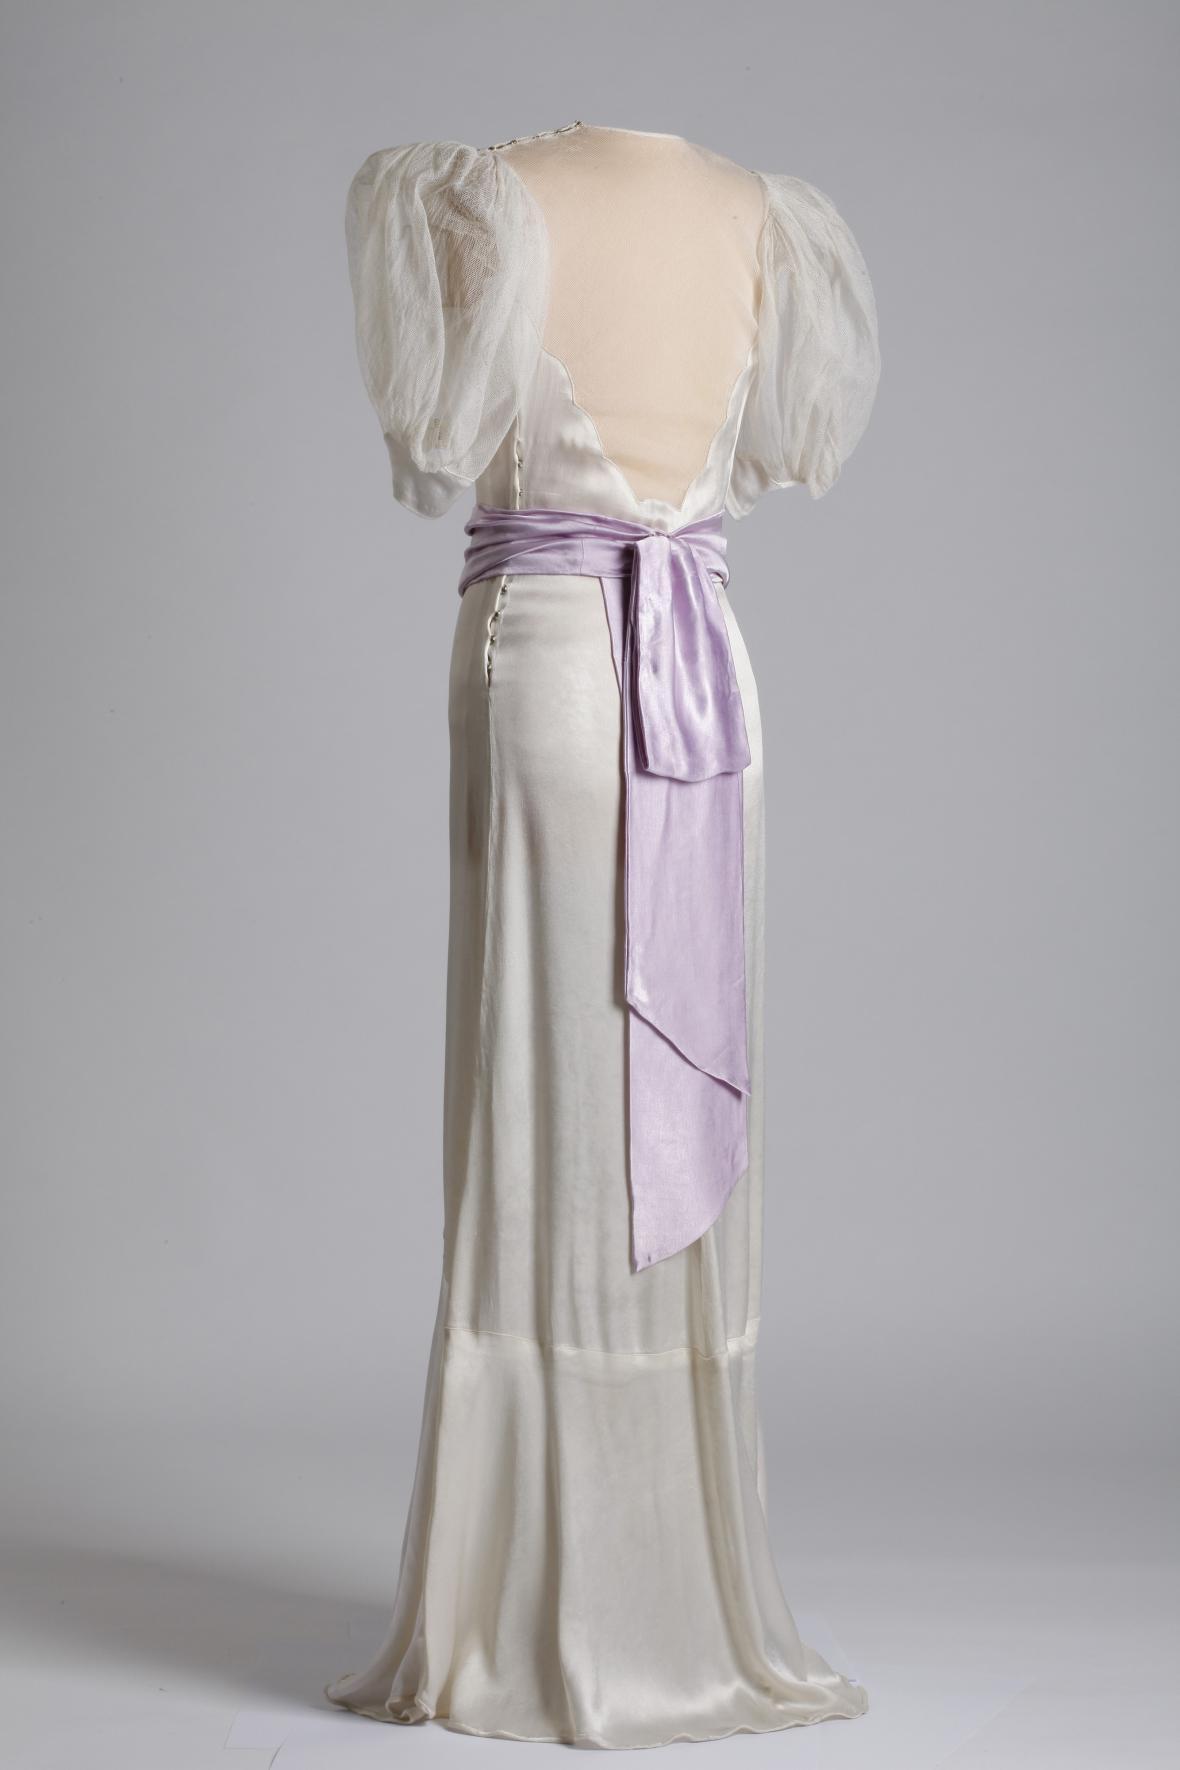 Dívčí šaty na ples s bohatými rukávy, acetátový satén a viskózový tyl, 1936